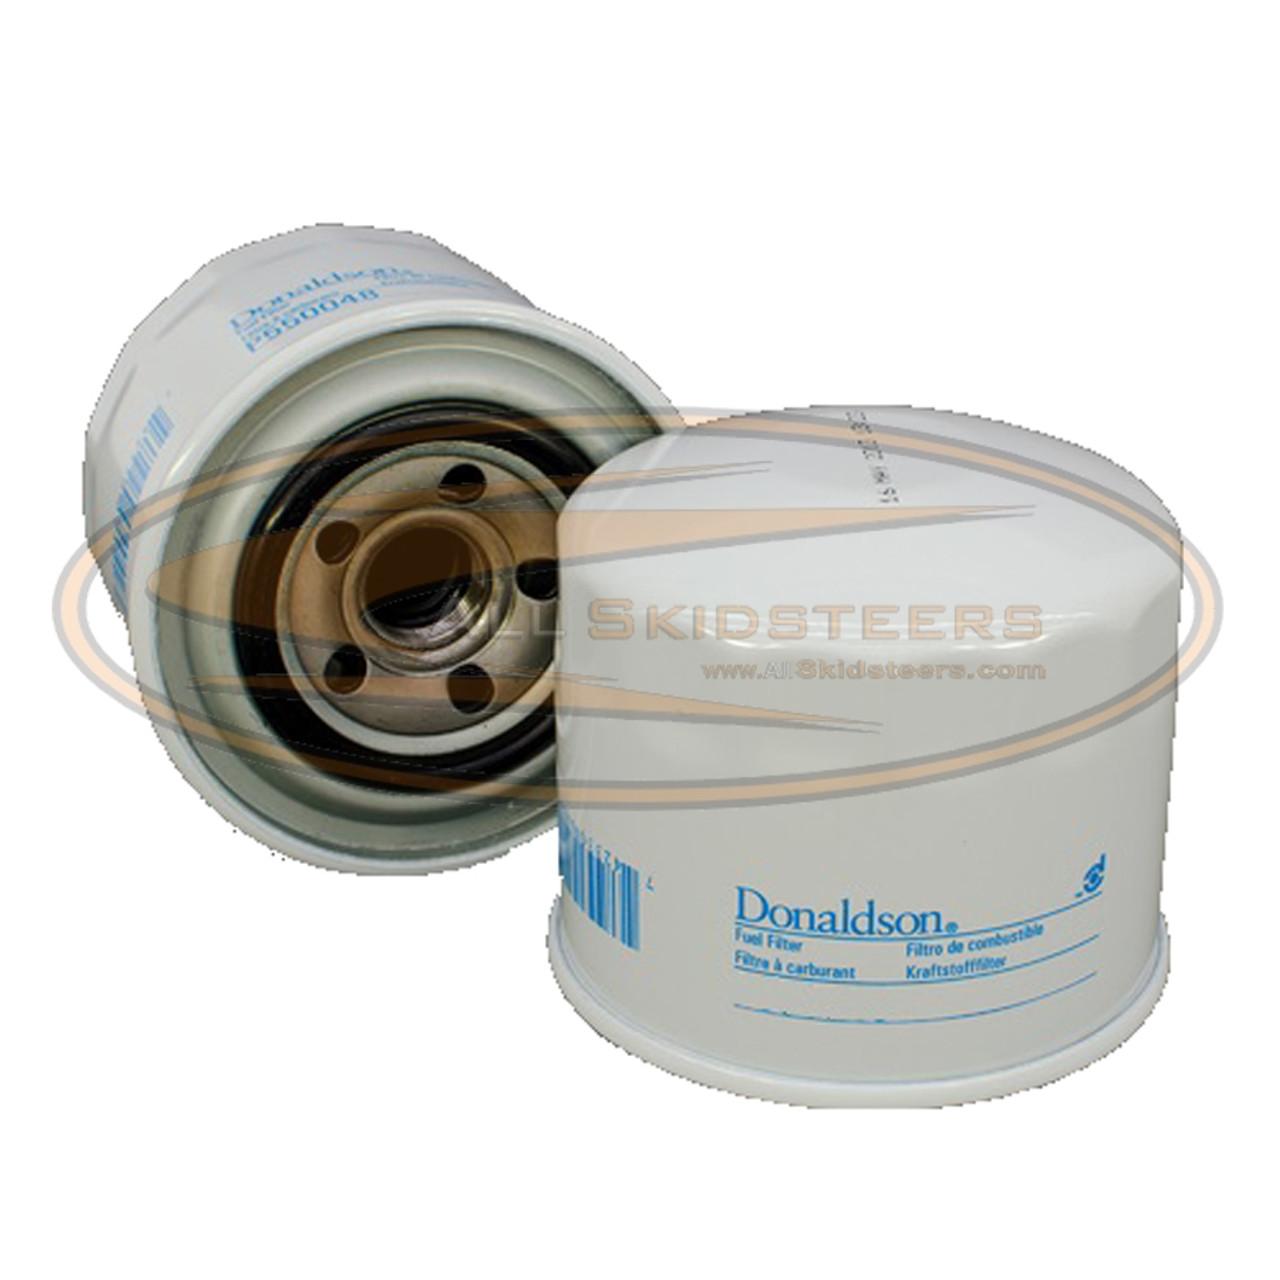 Fuel Filter for Doosan   Replaces OEM # 47100044A - All Skidsteers, Inc.AllSkidsteers